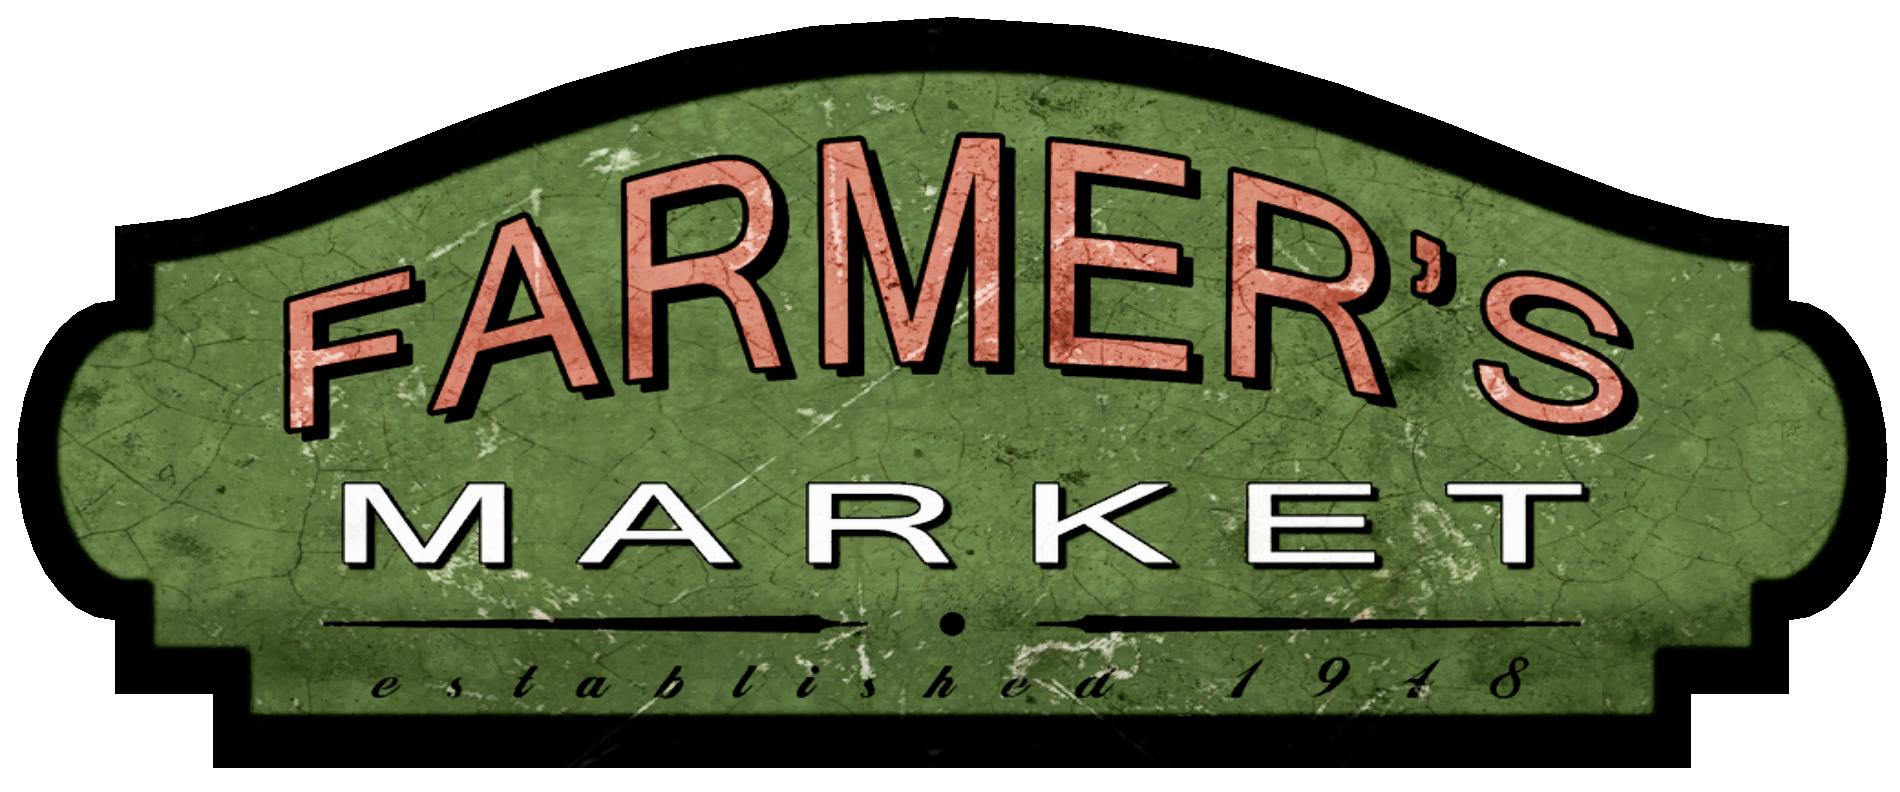 Farmeru0027s Market - Farmers Market PNG HD